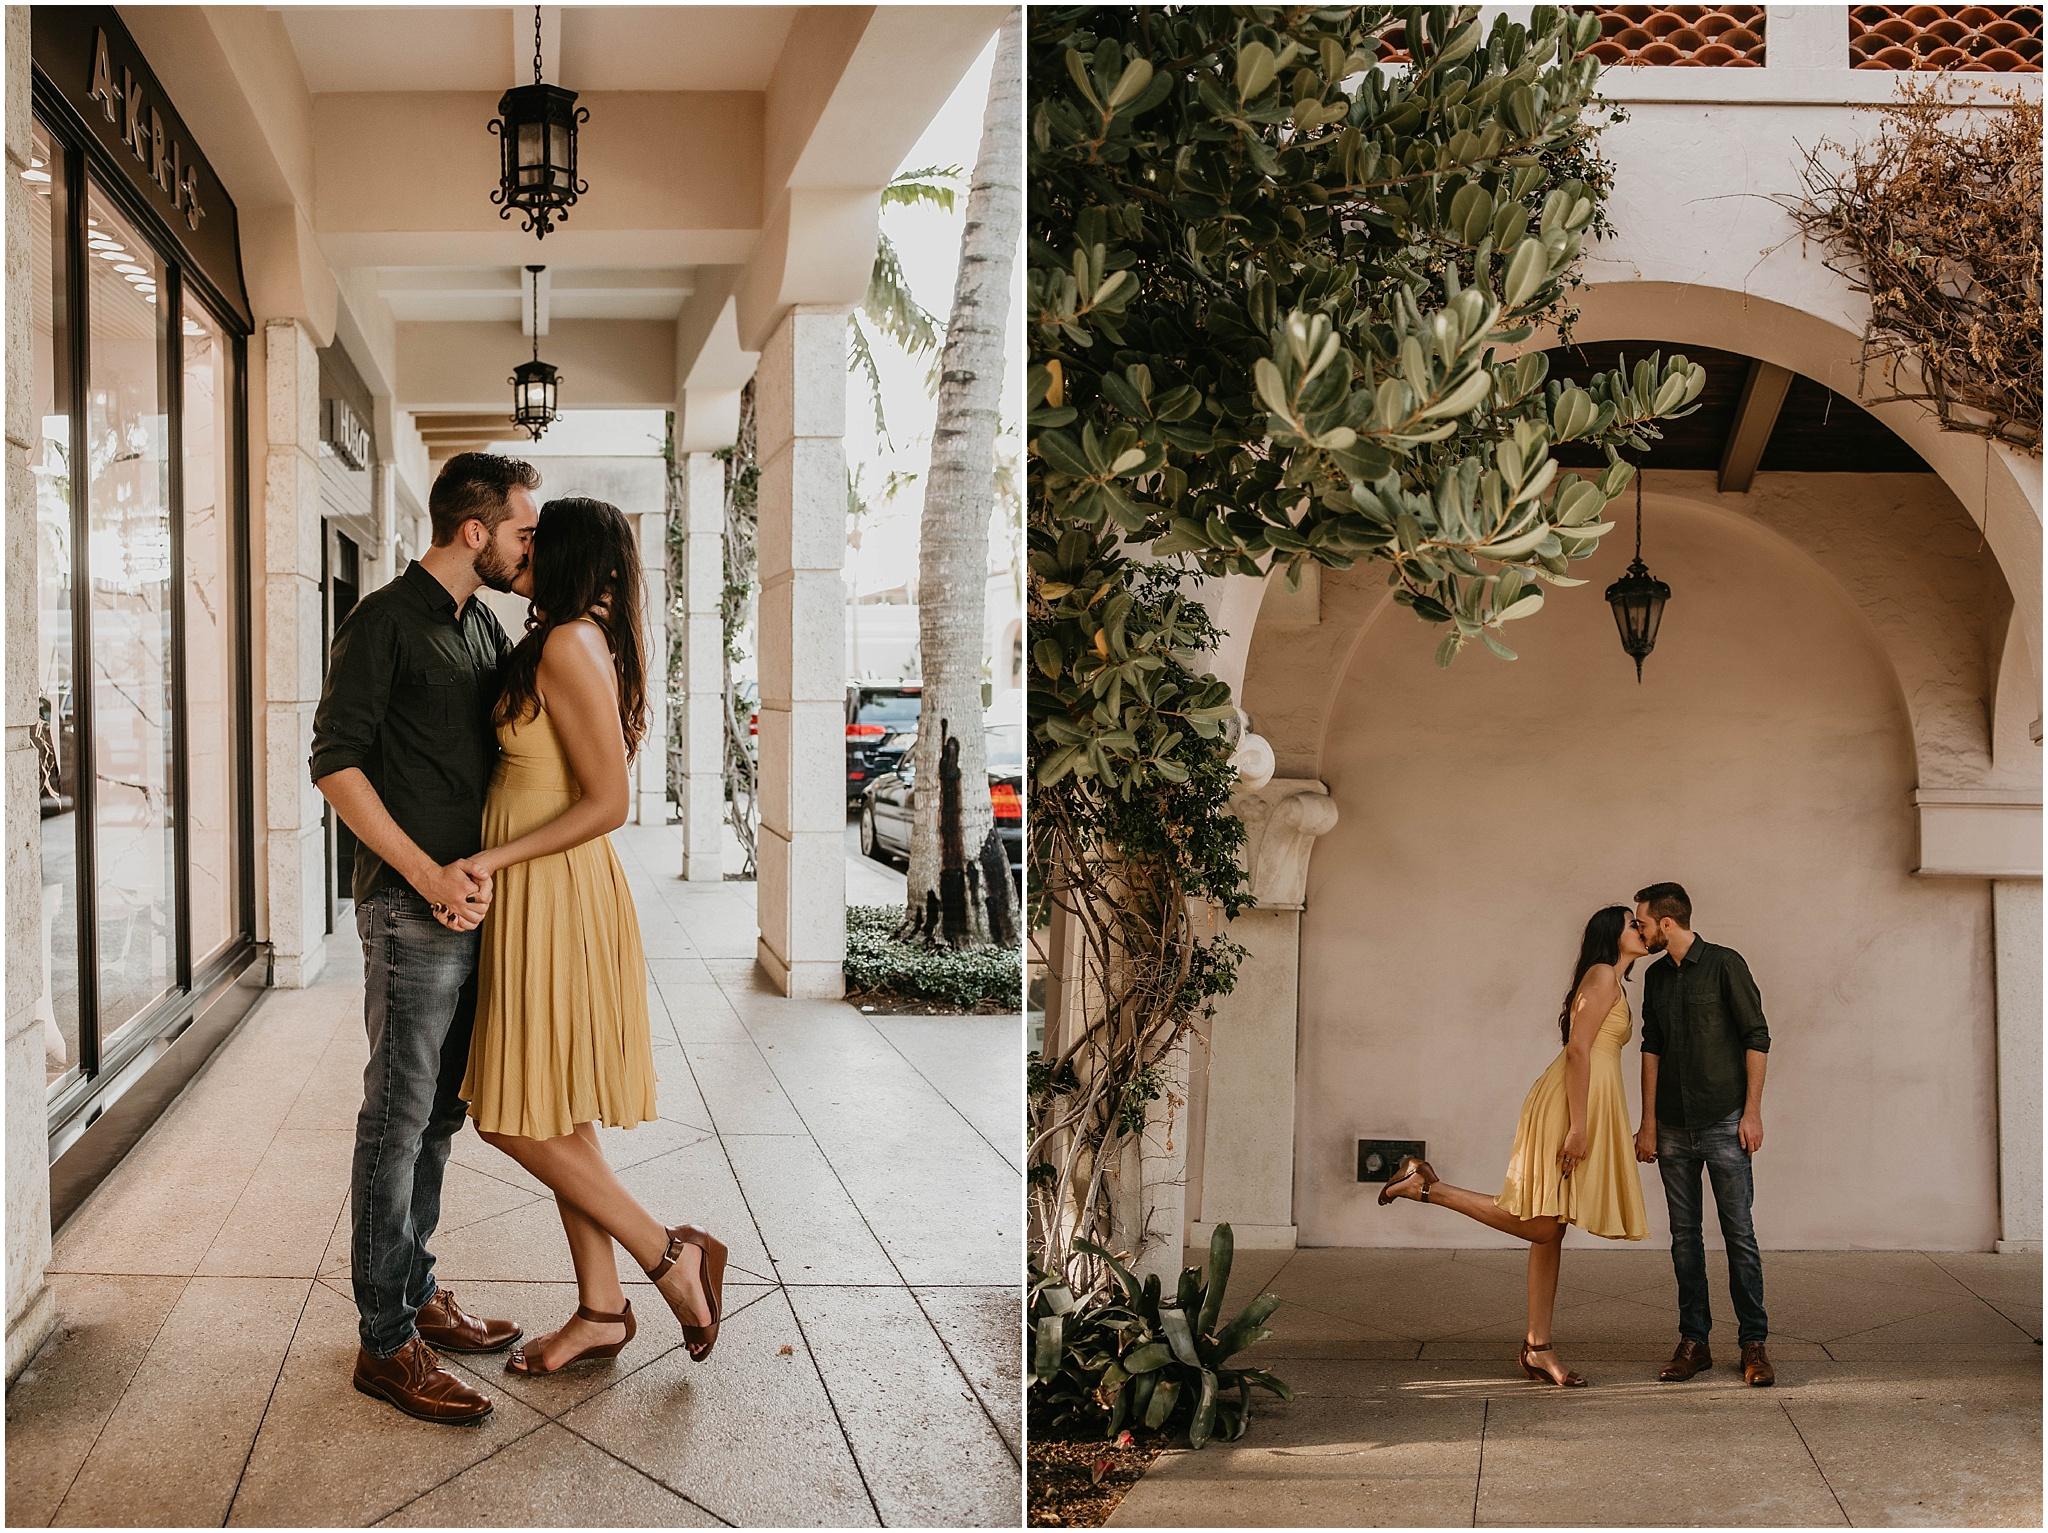 Worth-Avenue-Palm-Beach-engagement-photographer_0005.jpg